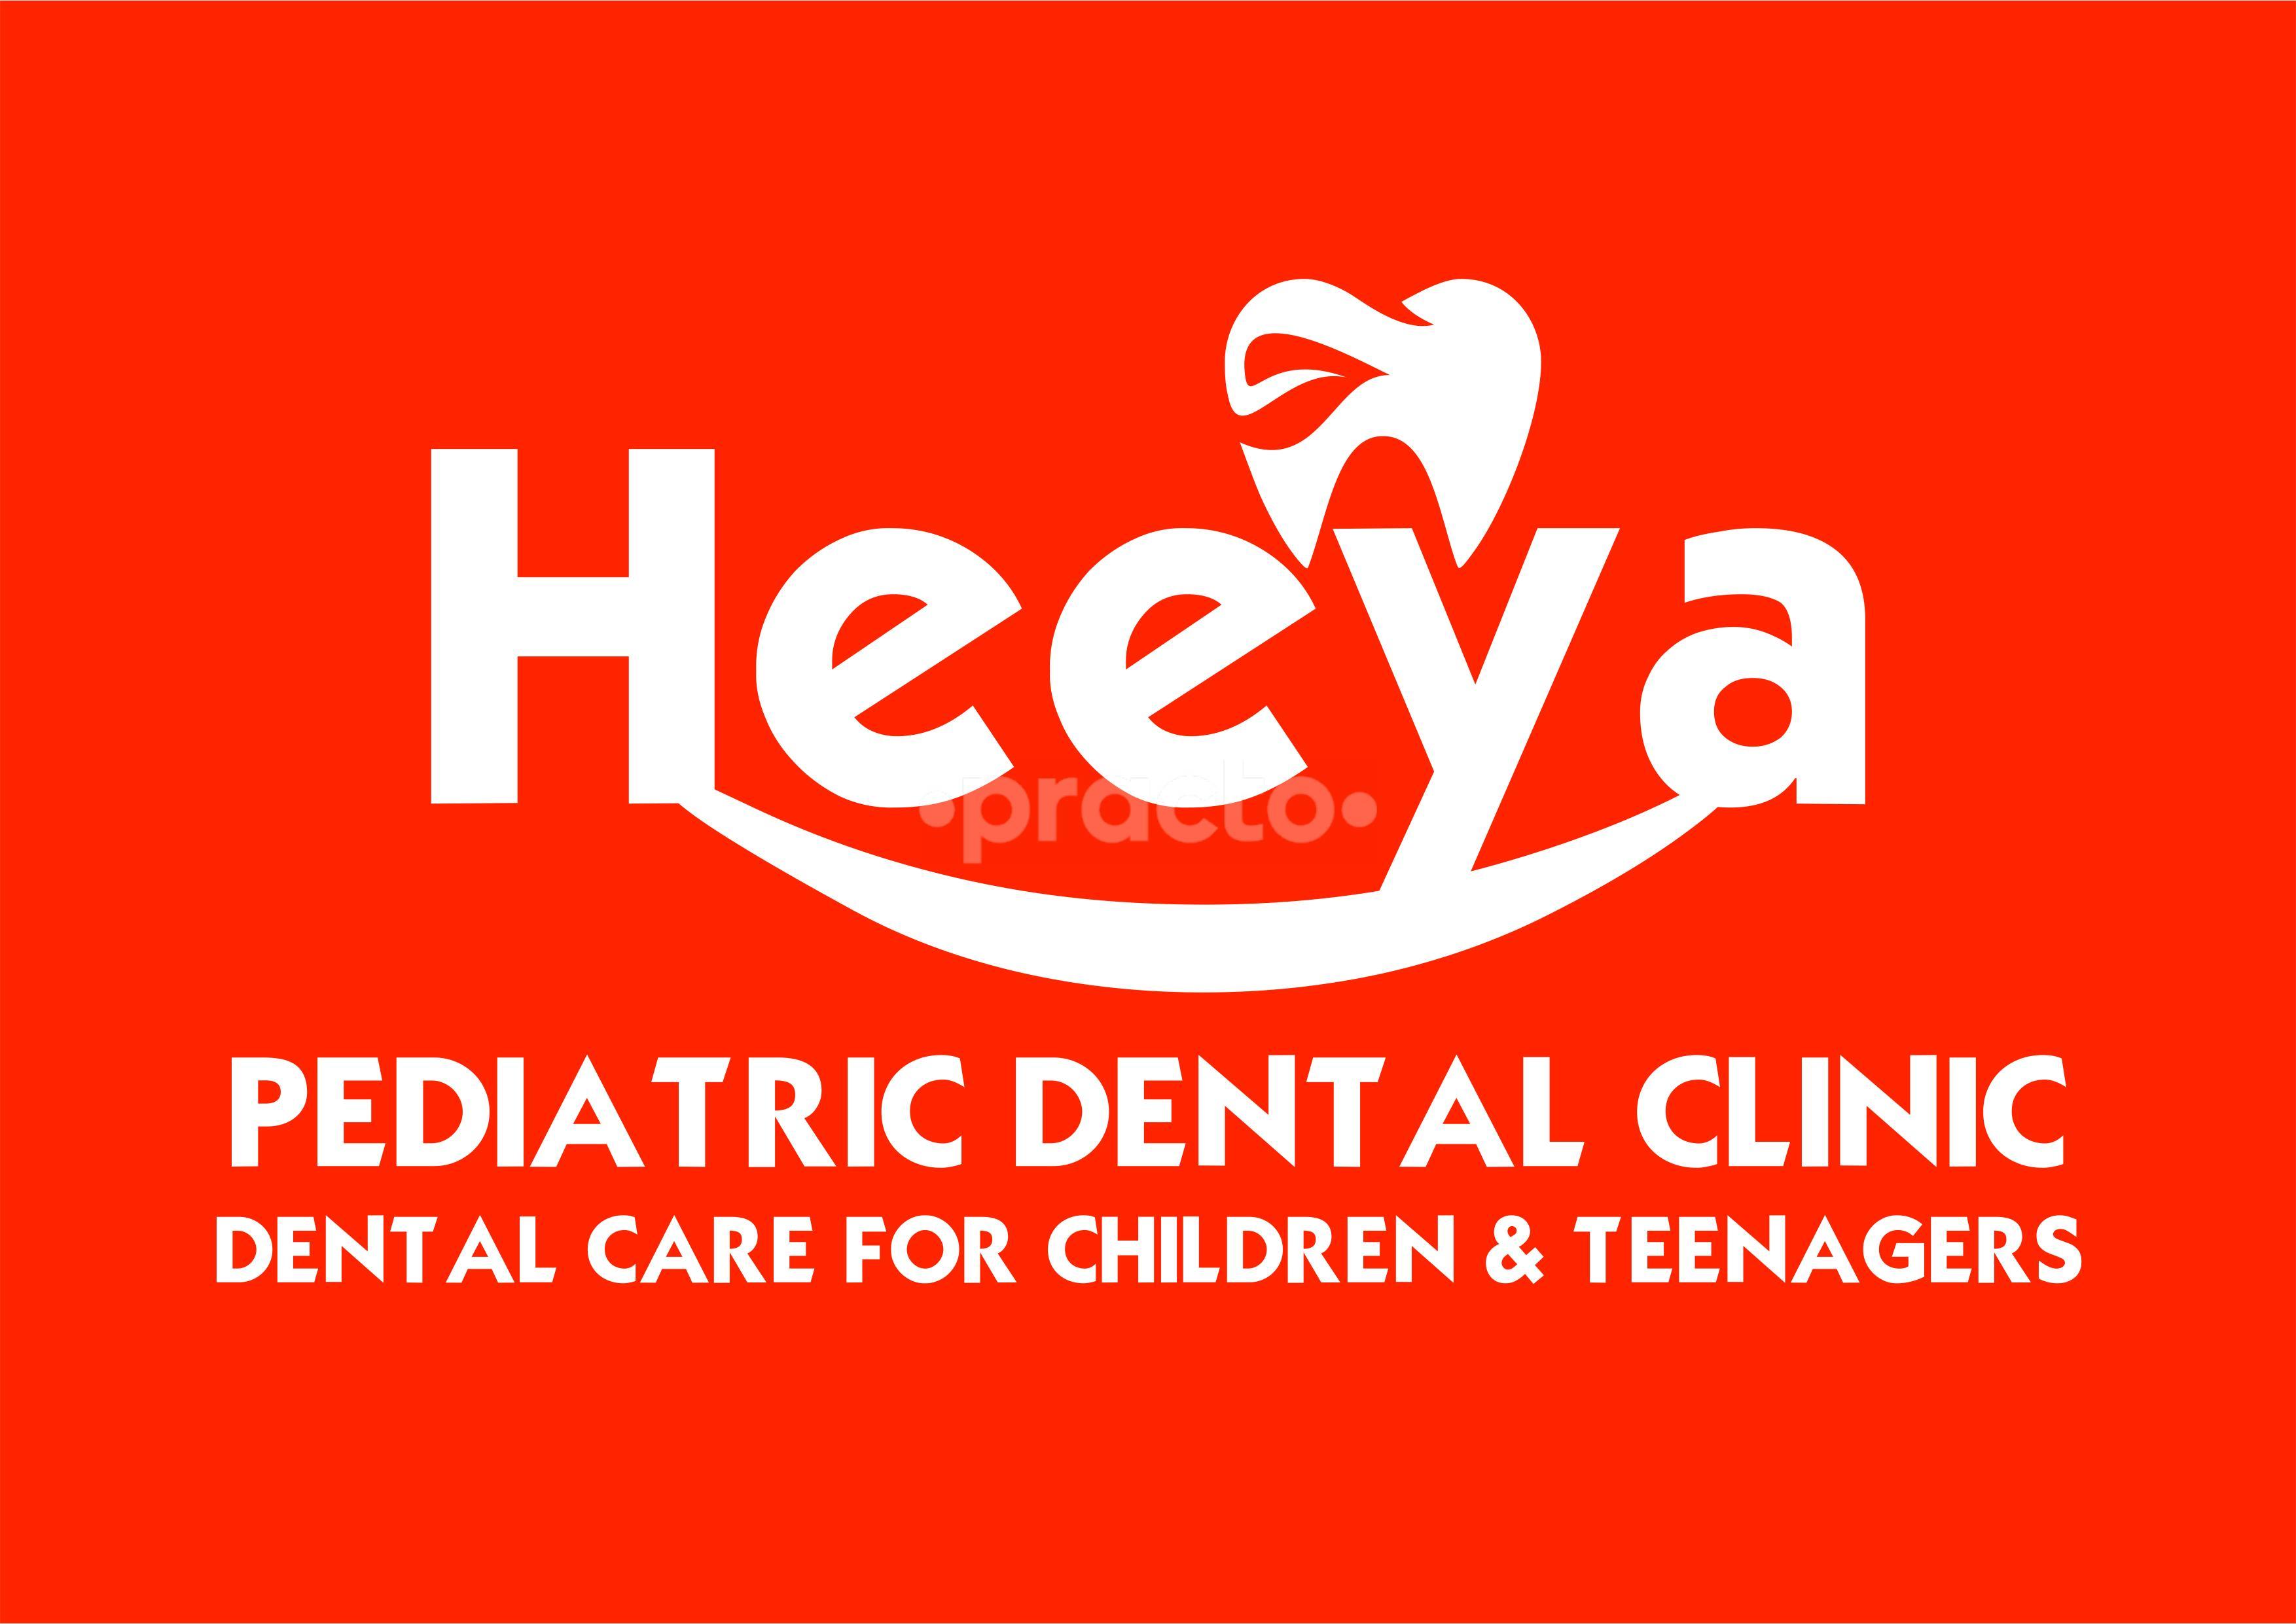 Heeya Pediatric Dental Clinic